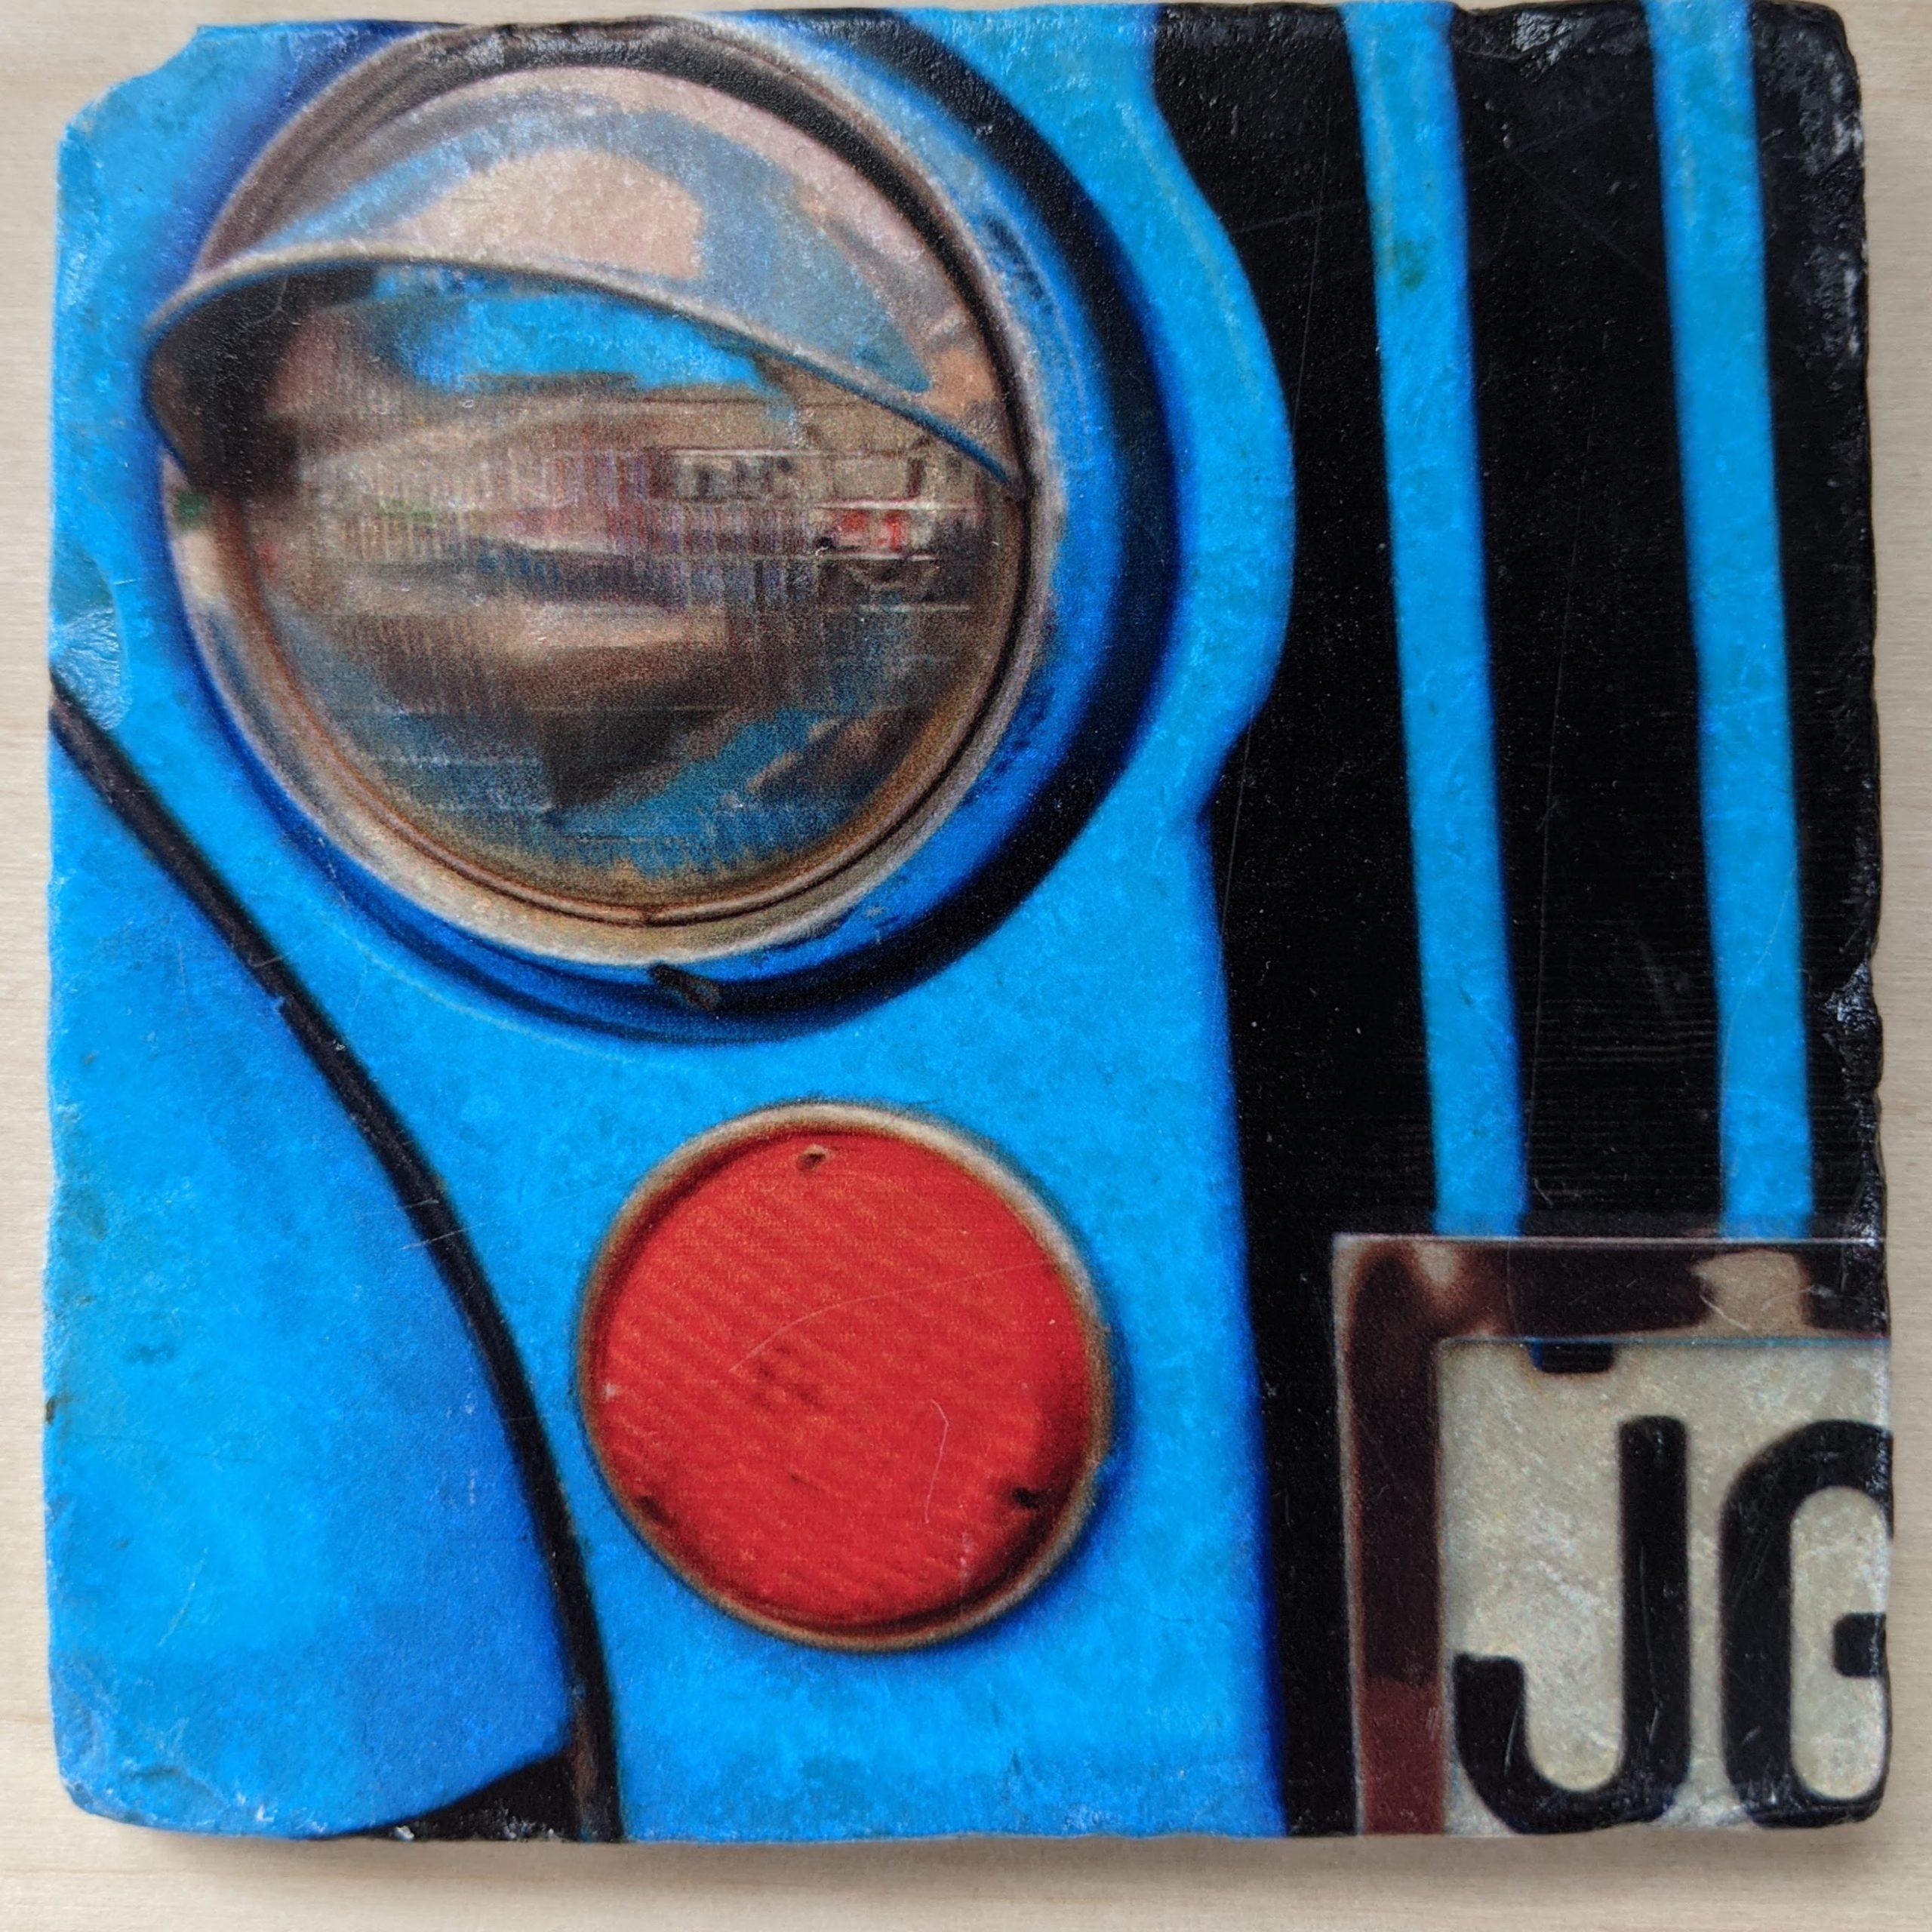 Jeep - Marble Art Coaster